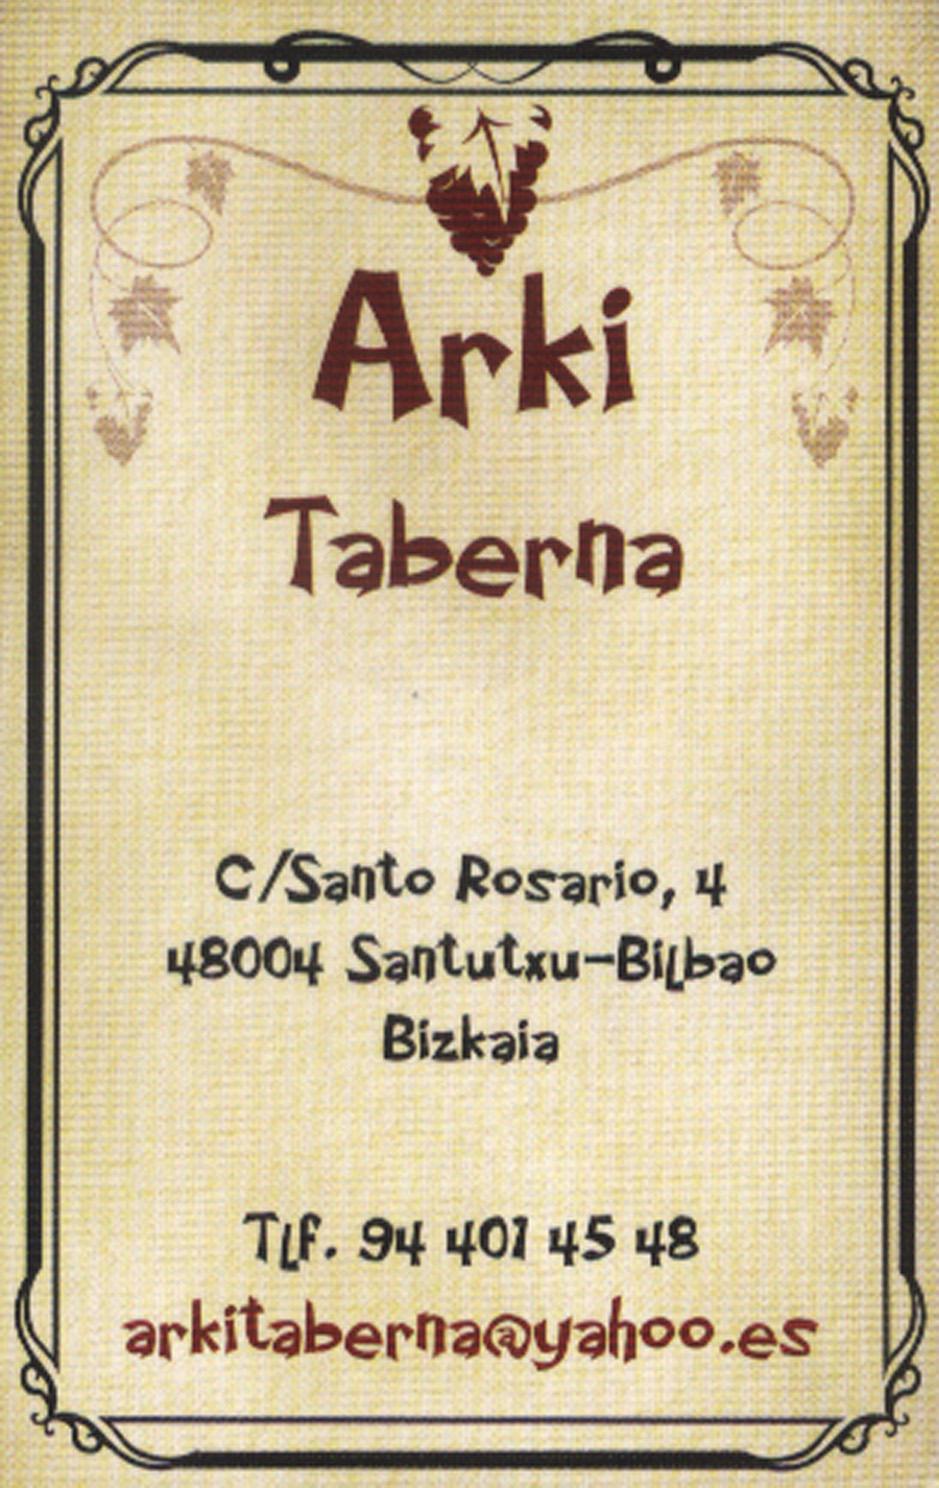 Arki Taberna